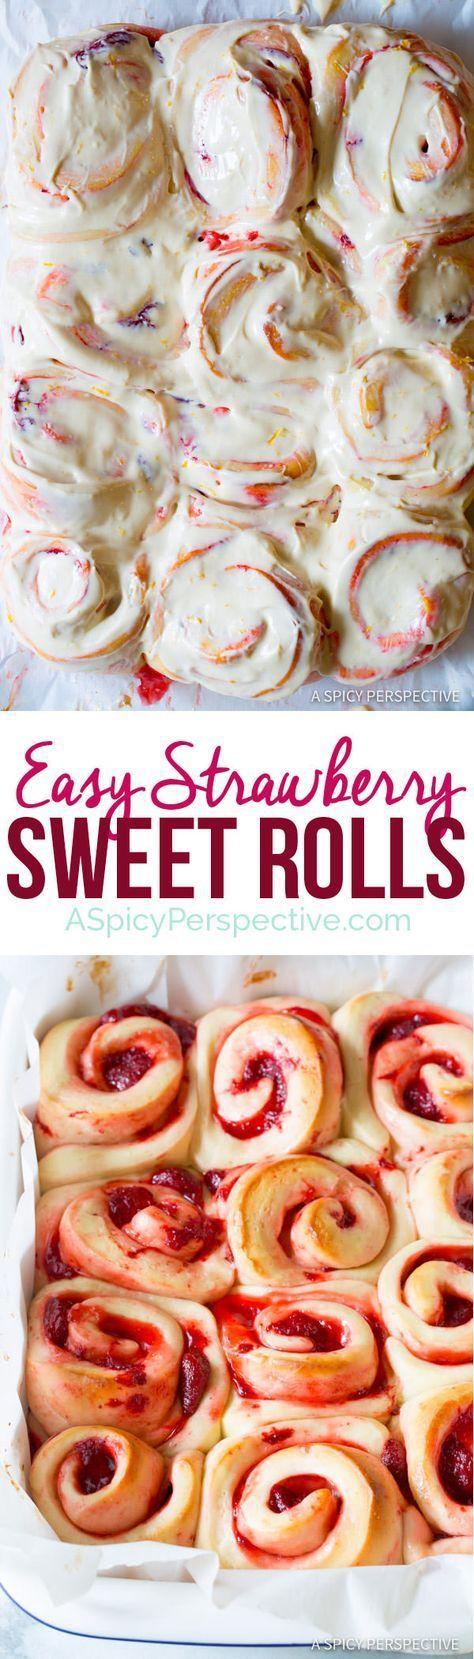 The Best Strawberry Sweet Rolls Recipe | ASpicyPerspective...